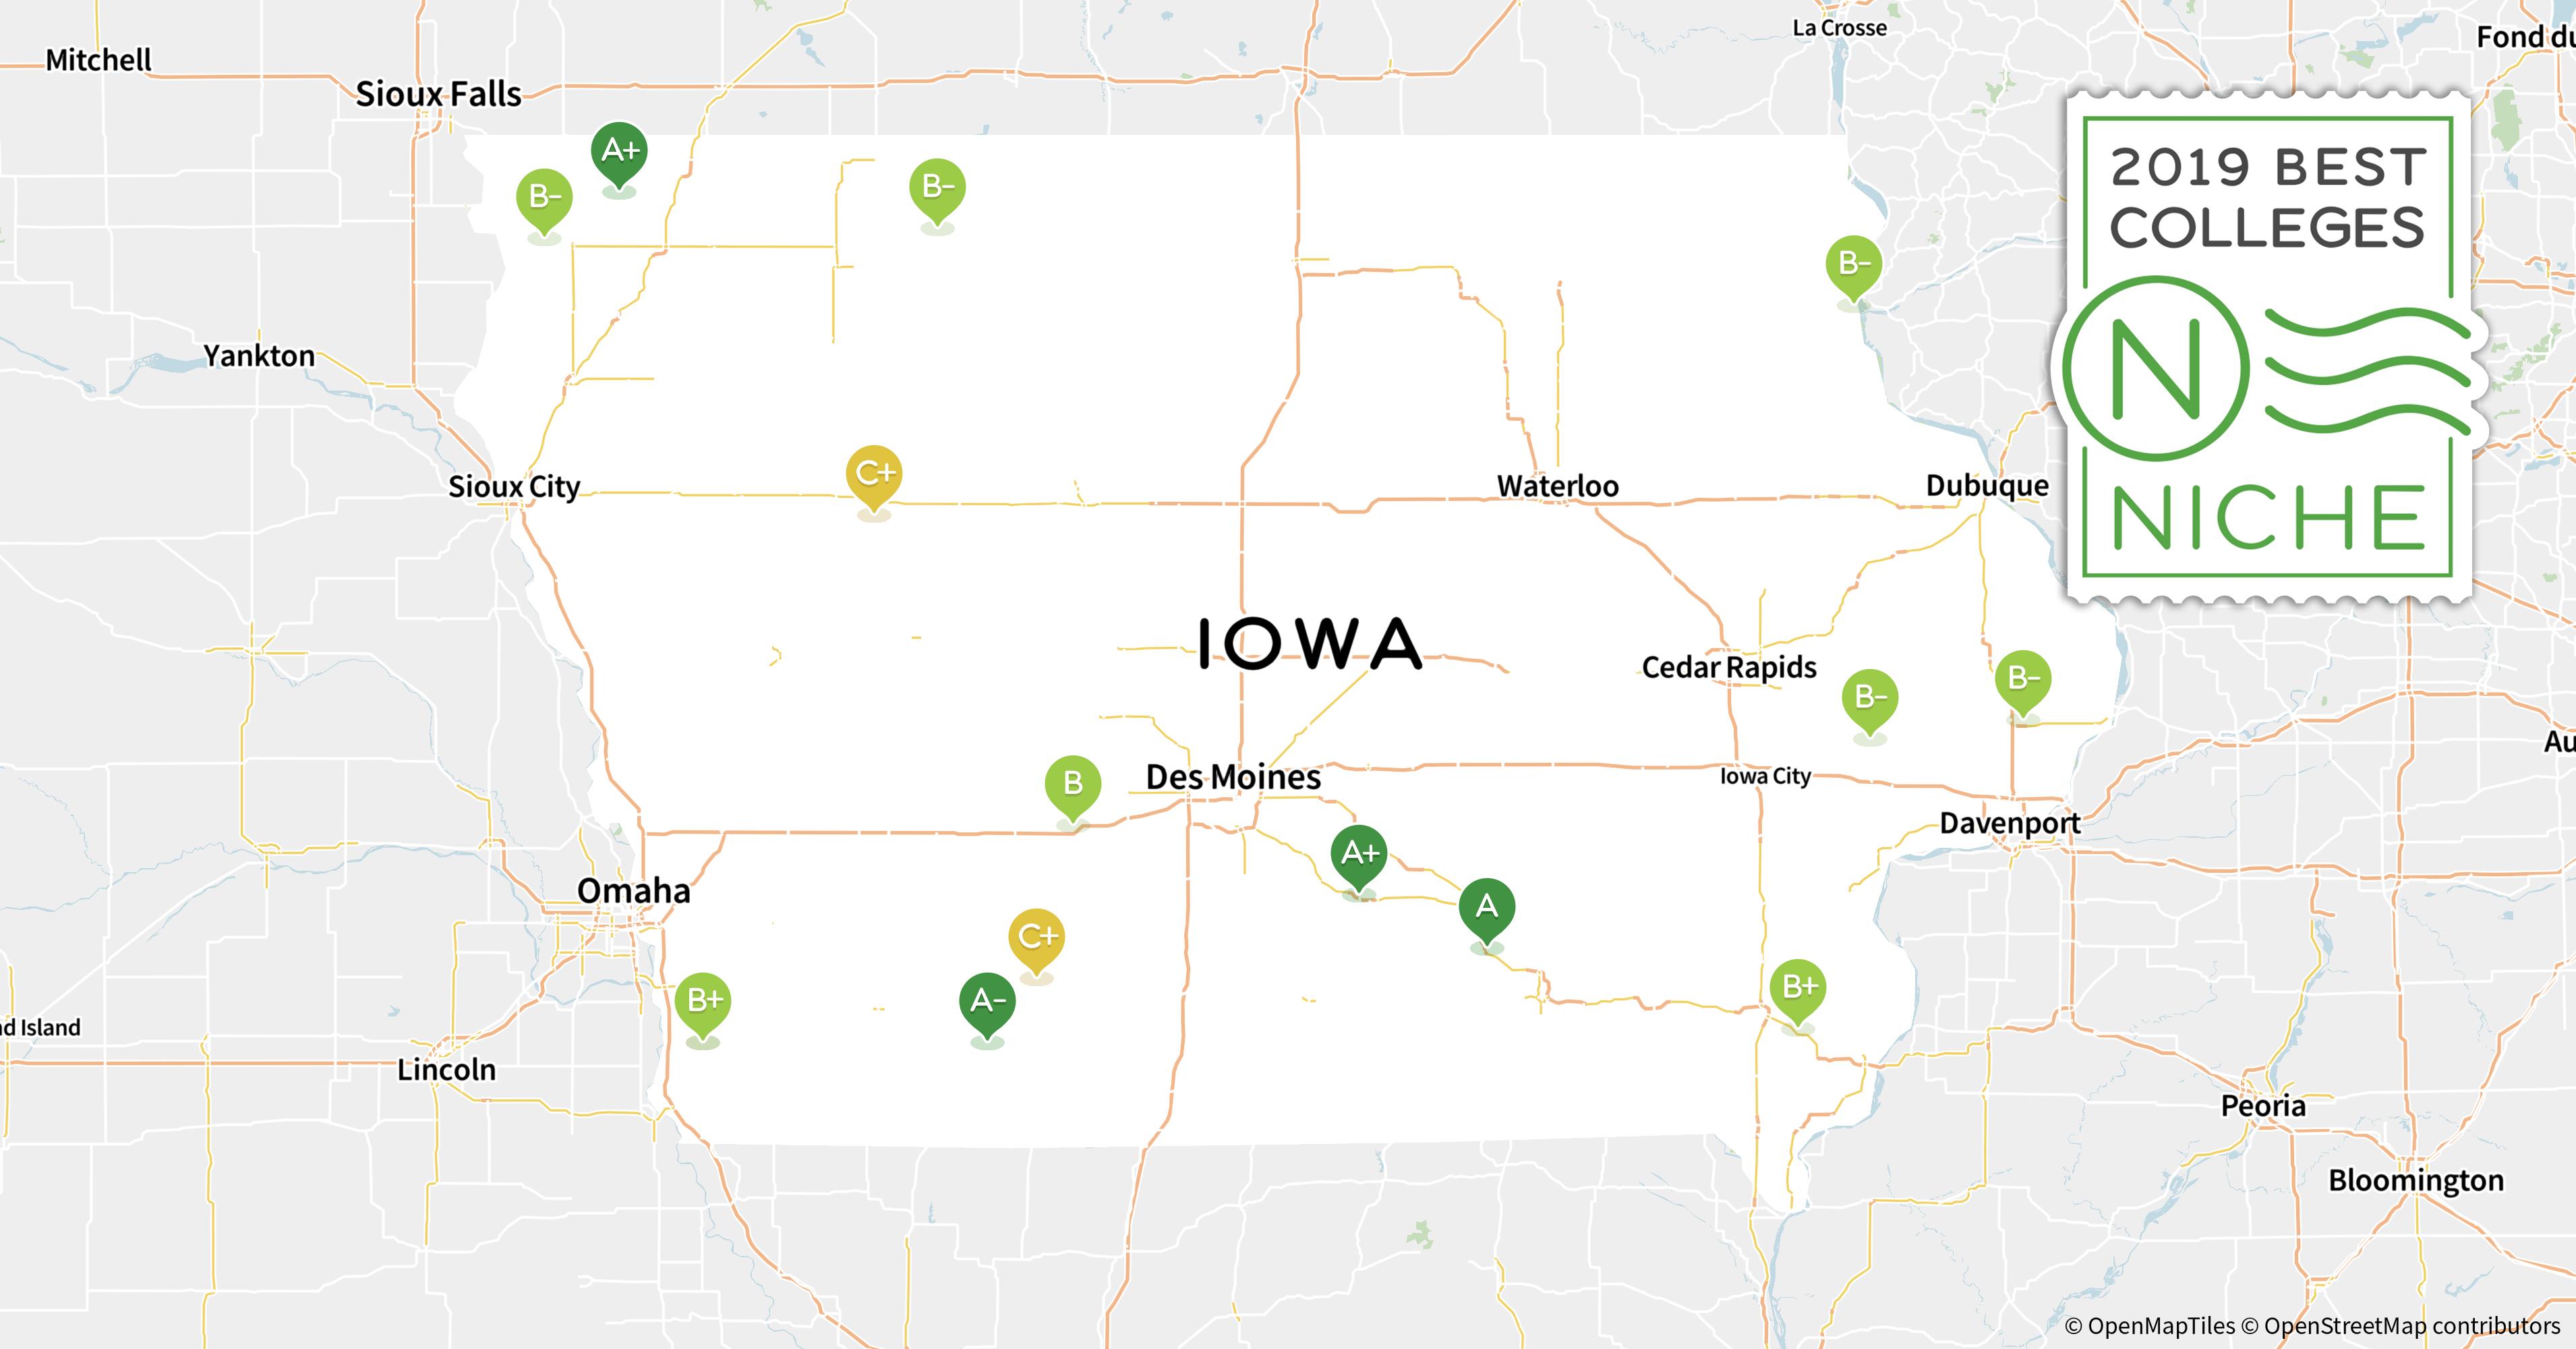 2019 Top Graduate Programs in Iowa - Niche